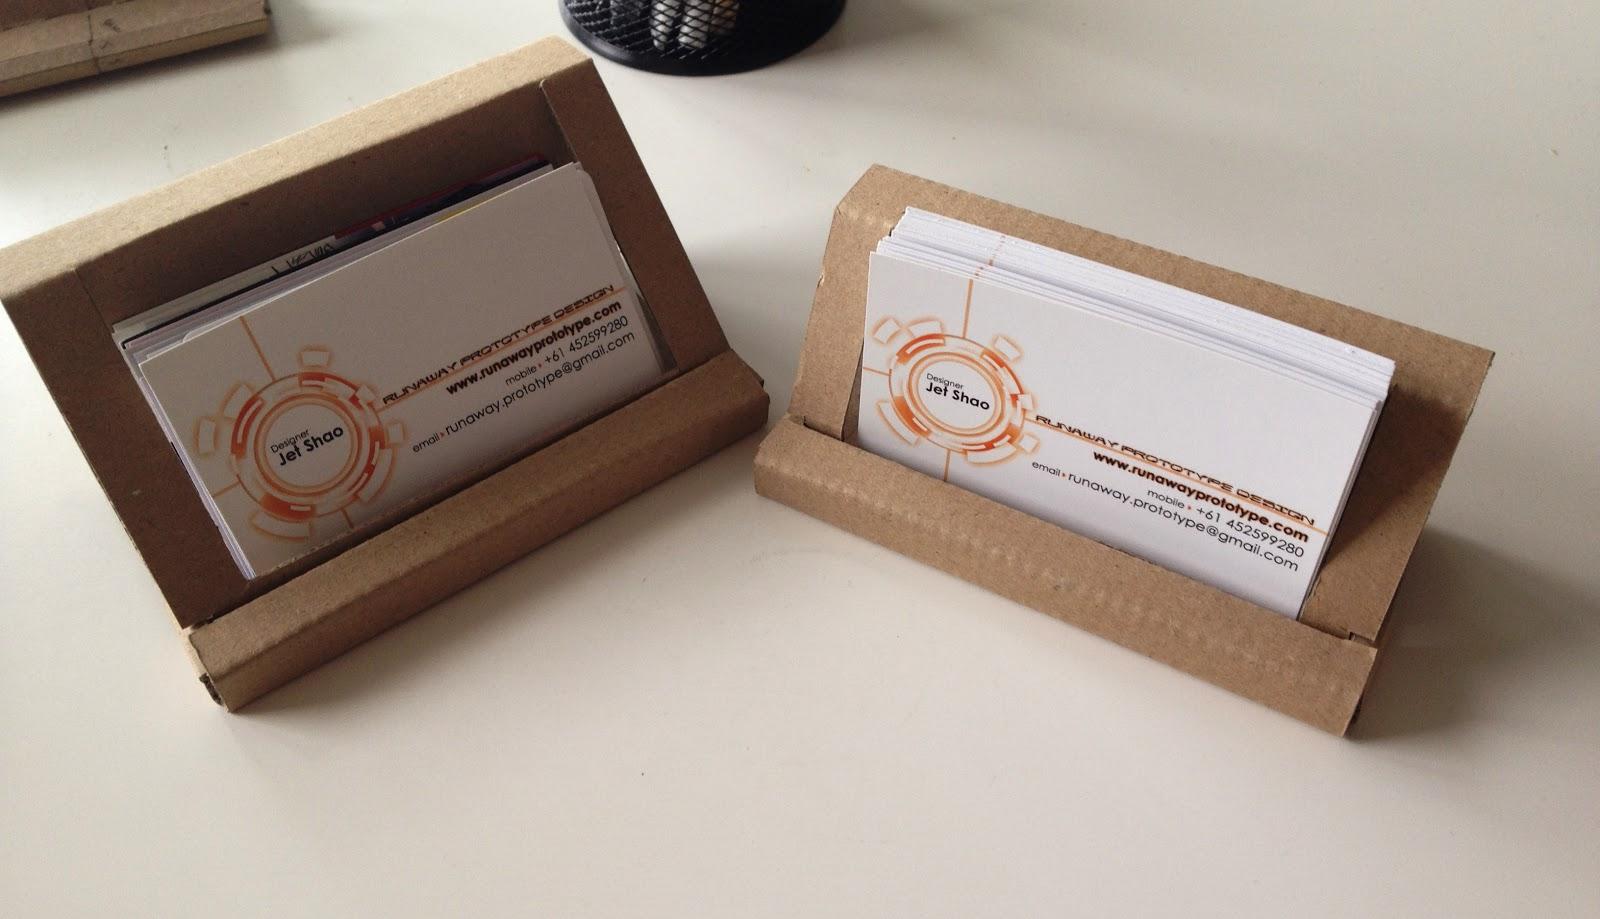 Cardboard business card holder arts arts runaway prototype design cardboard business card holder reloaded fbccfo Choice Image